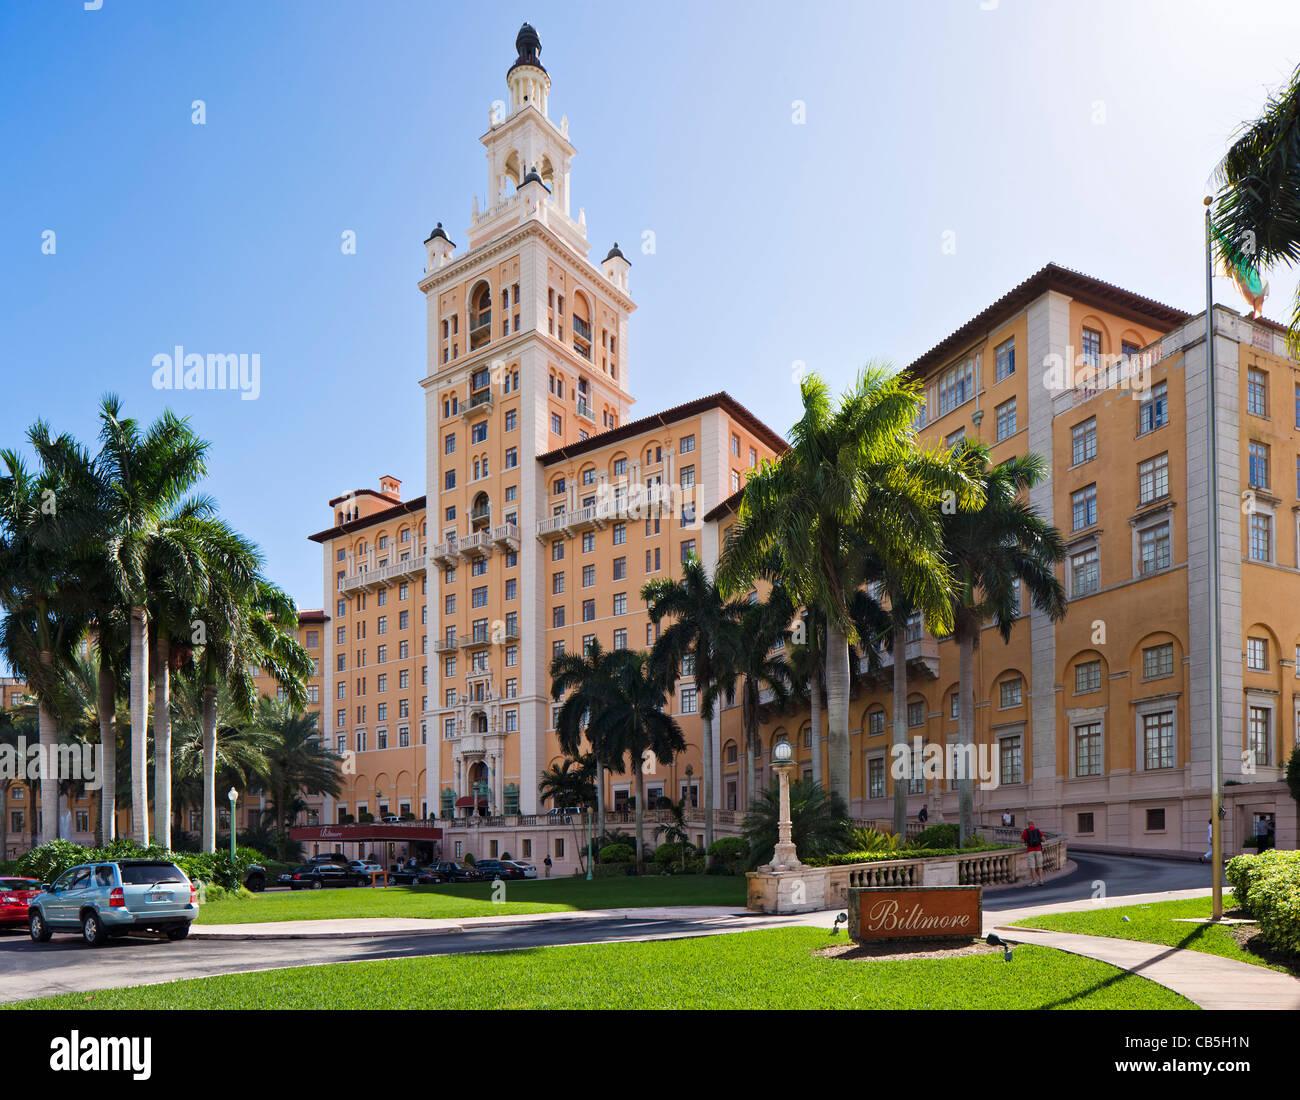 The Biltmore Hotel, Coral Gables, Miami, Florida, USA Stock Photo